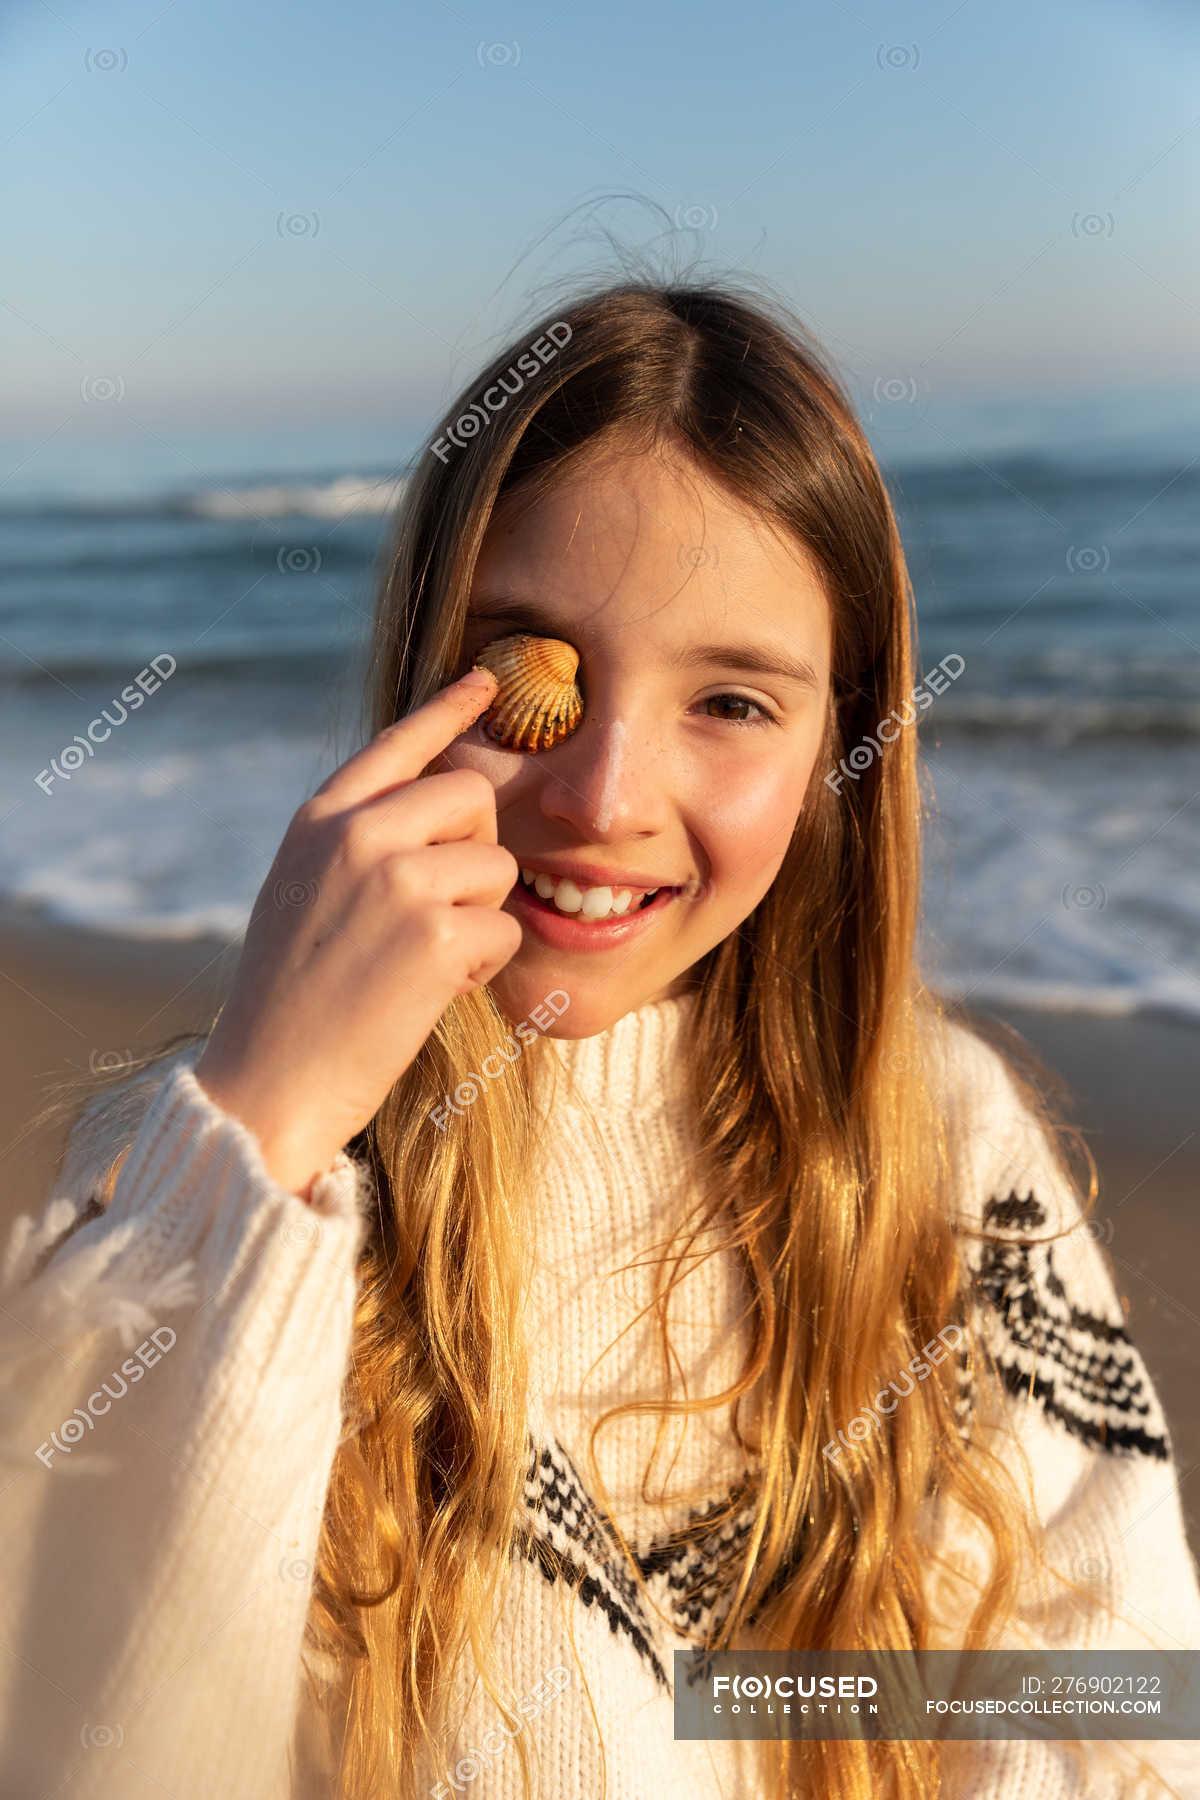 اجمل صور بنات 2020 اجمل صور بنات اطفال خلفيات بنات صغيره جميلة جدا 29